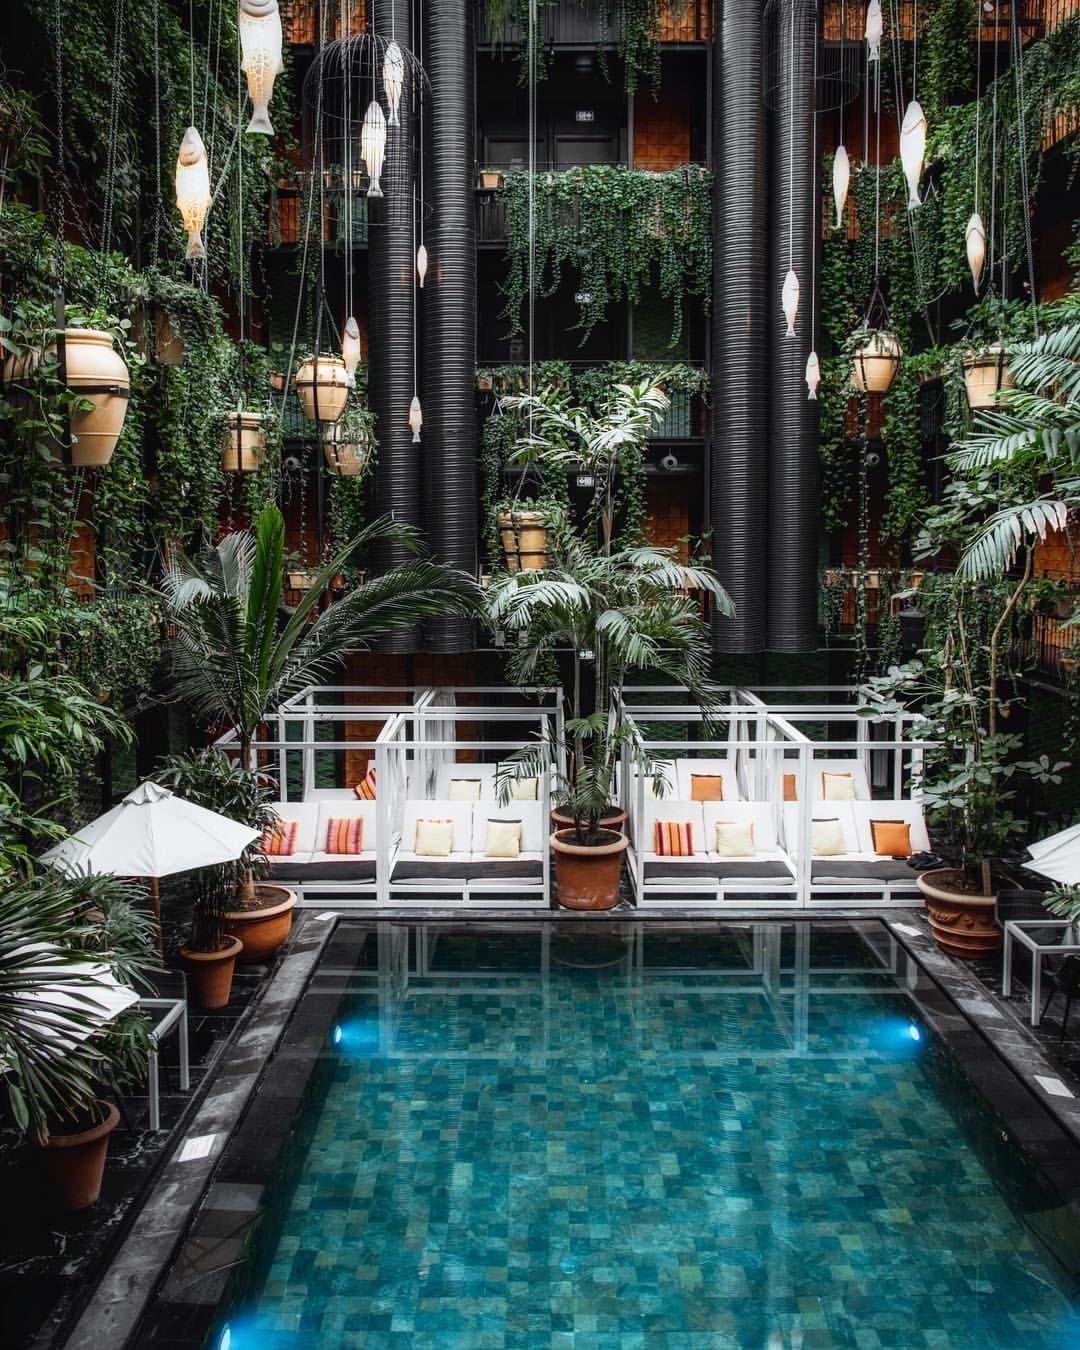 Manon Les Suites Guldsmeden Hotel cb75363ceed33